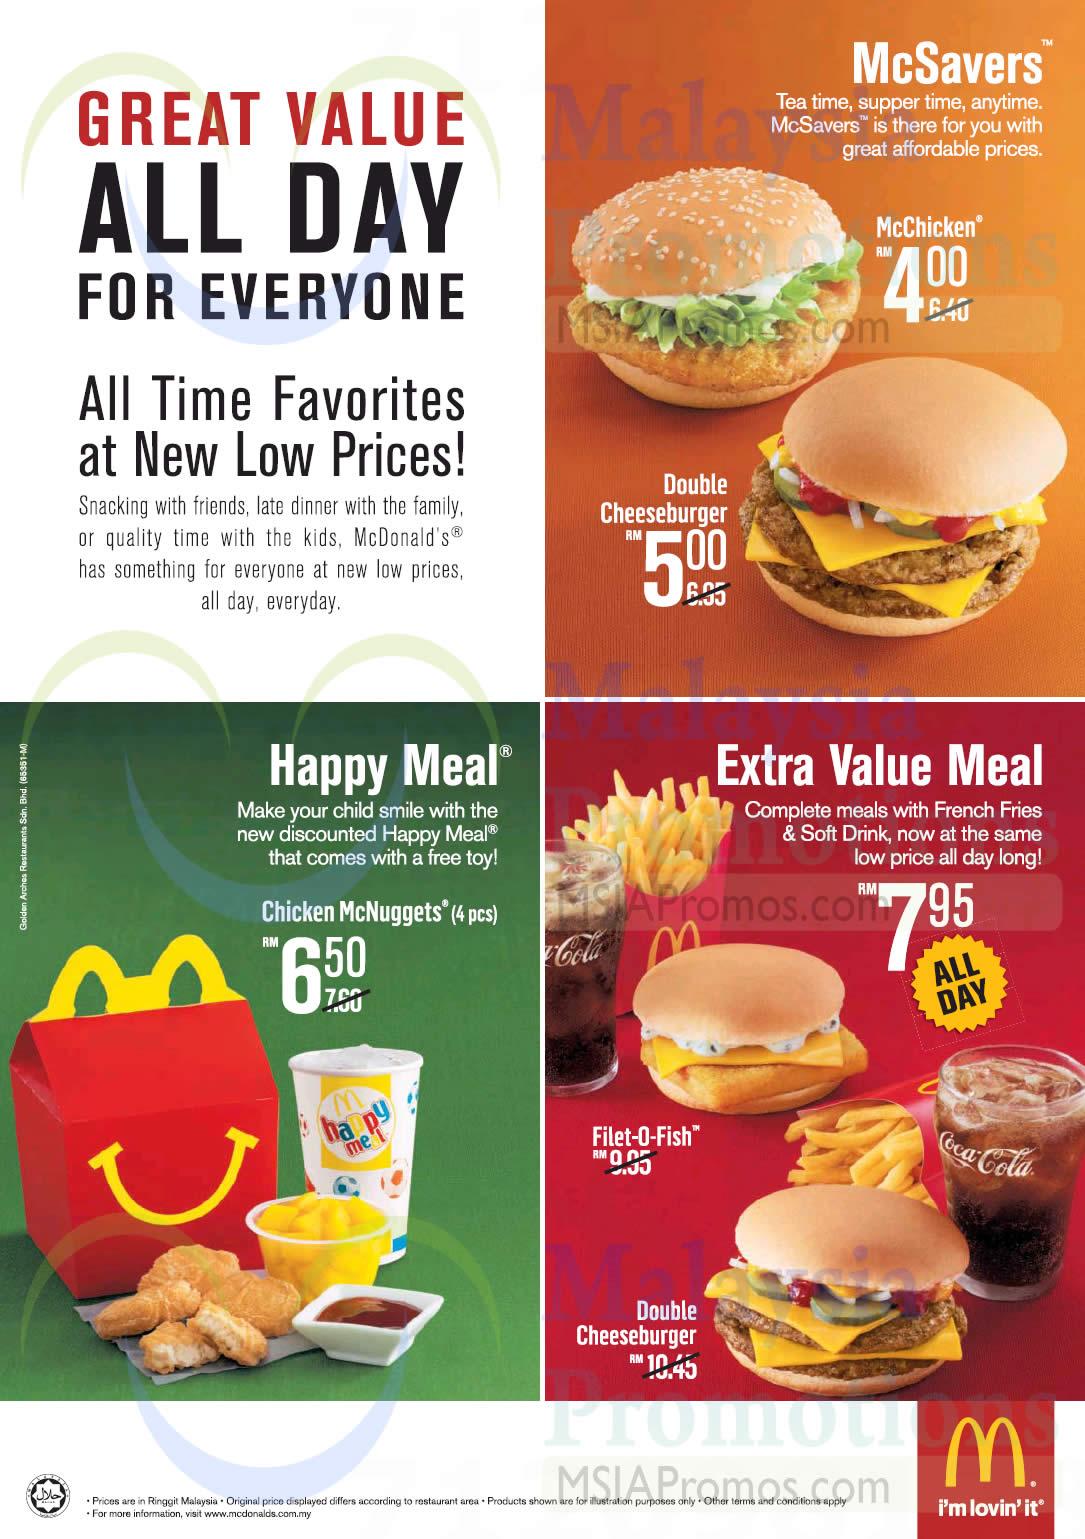 Mcdonald s great value meals 6 mar 2015 for Mcdonald s filet o fish price